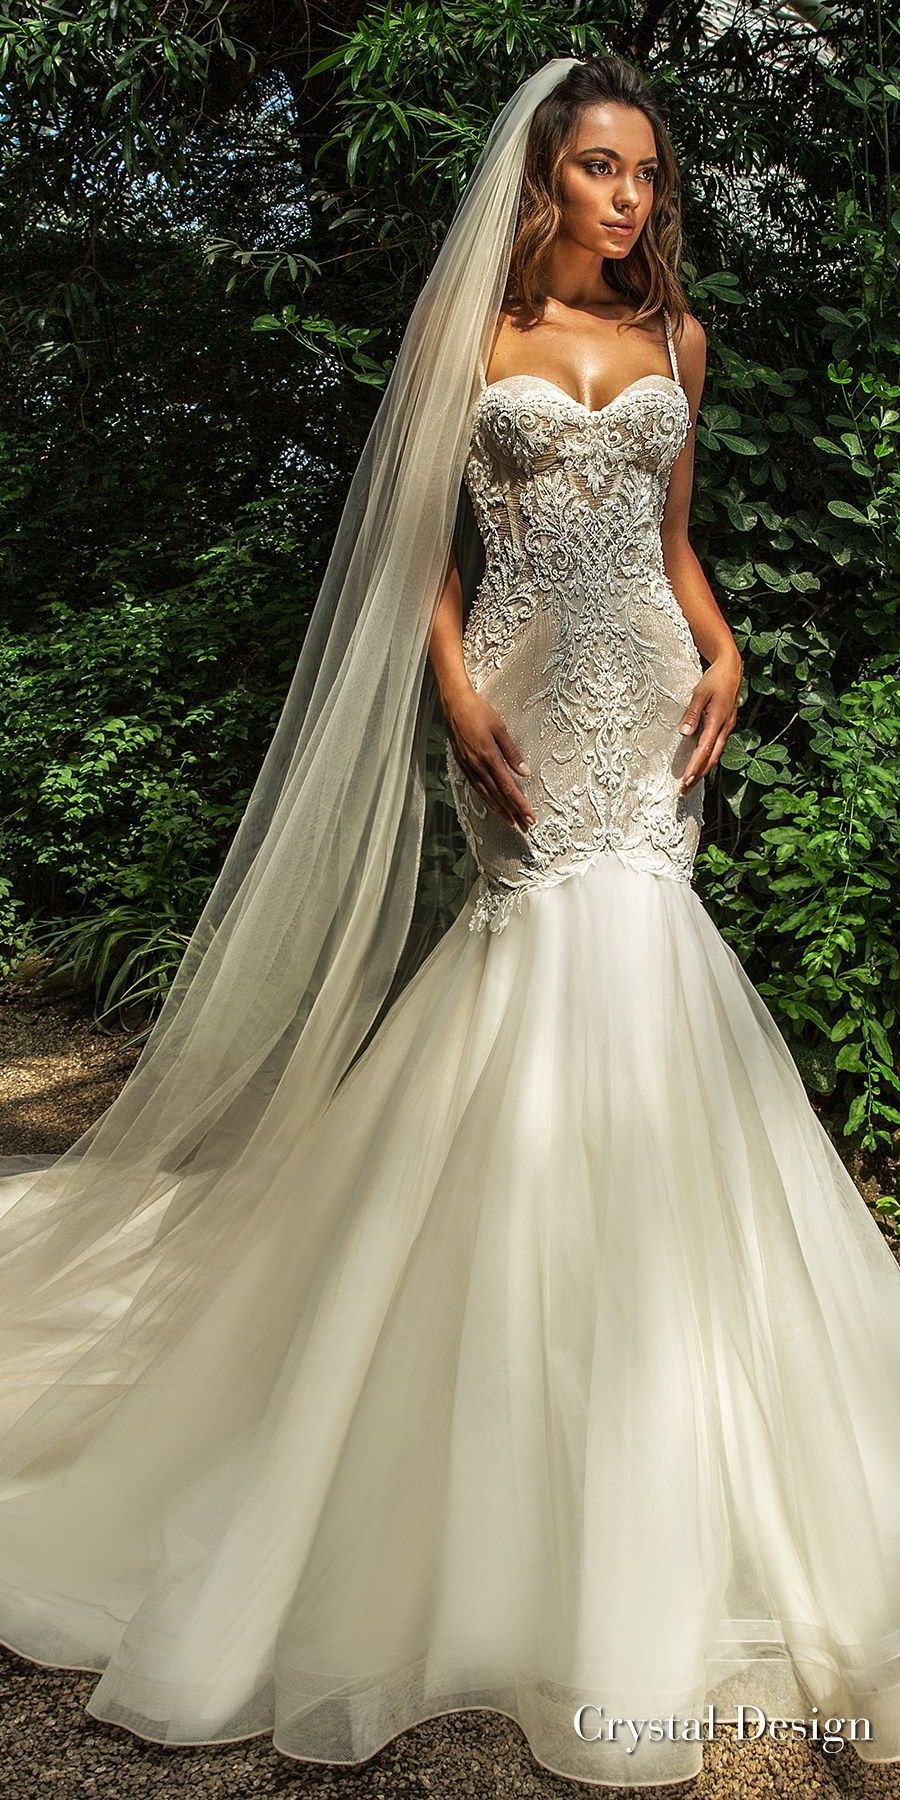 Dress for destination beach wedding guest  Crystal Design  Wedding Dresses u ucRoyal Gardenud u Haute Couture